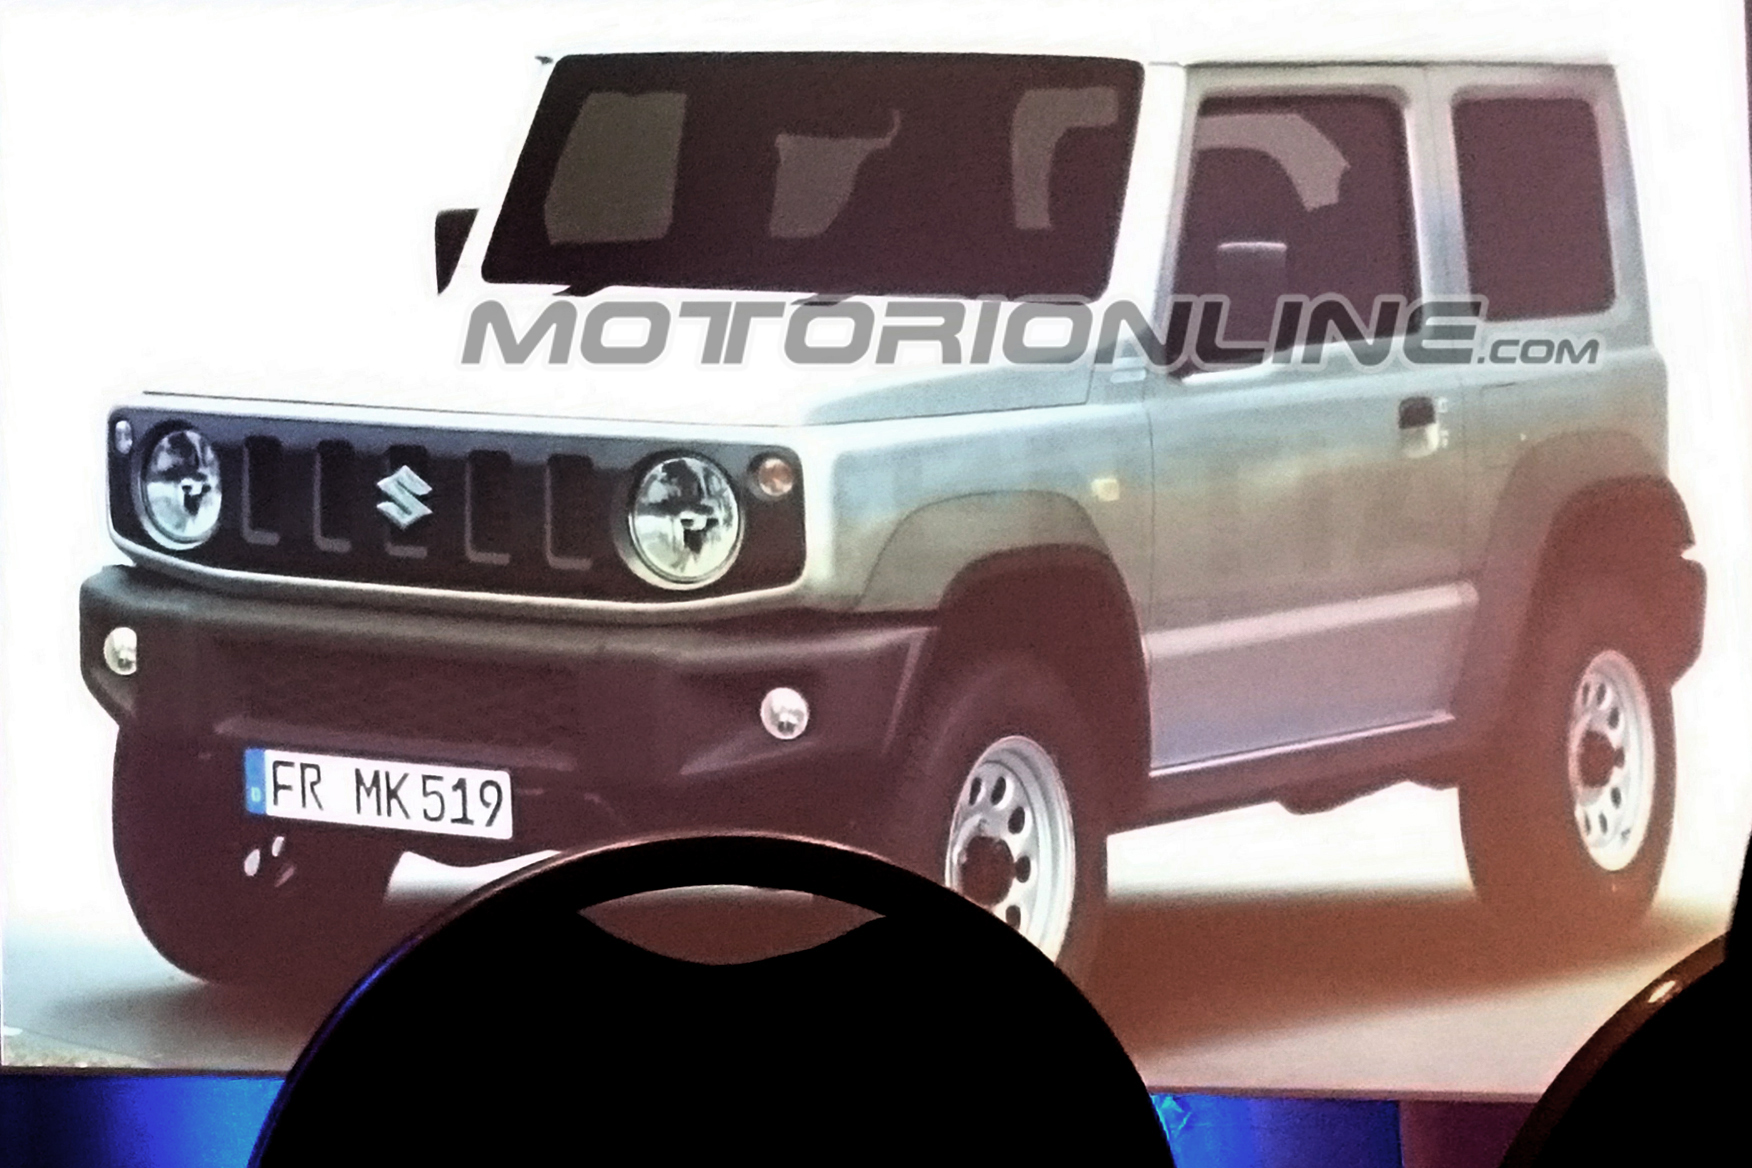 Suzuki Jimny foto leaked 23 Agosto 2017